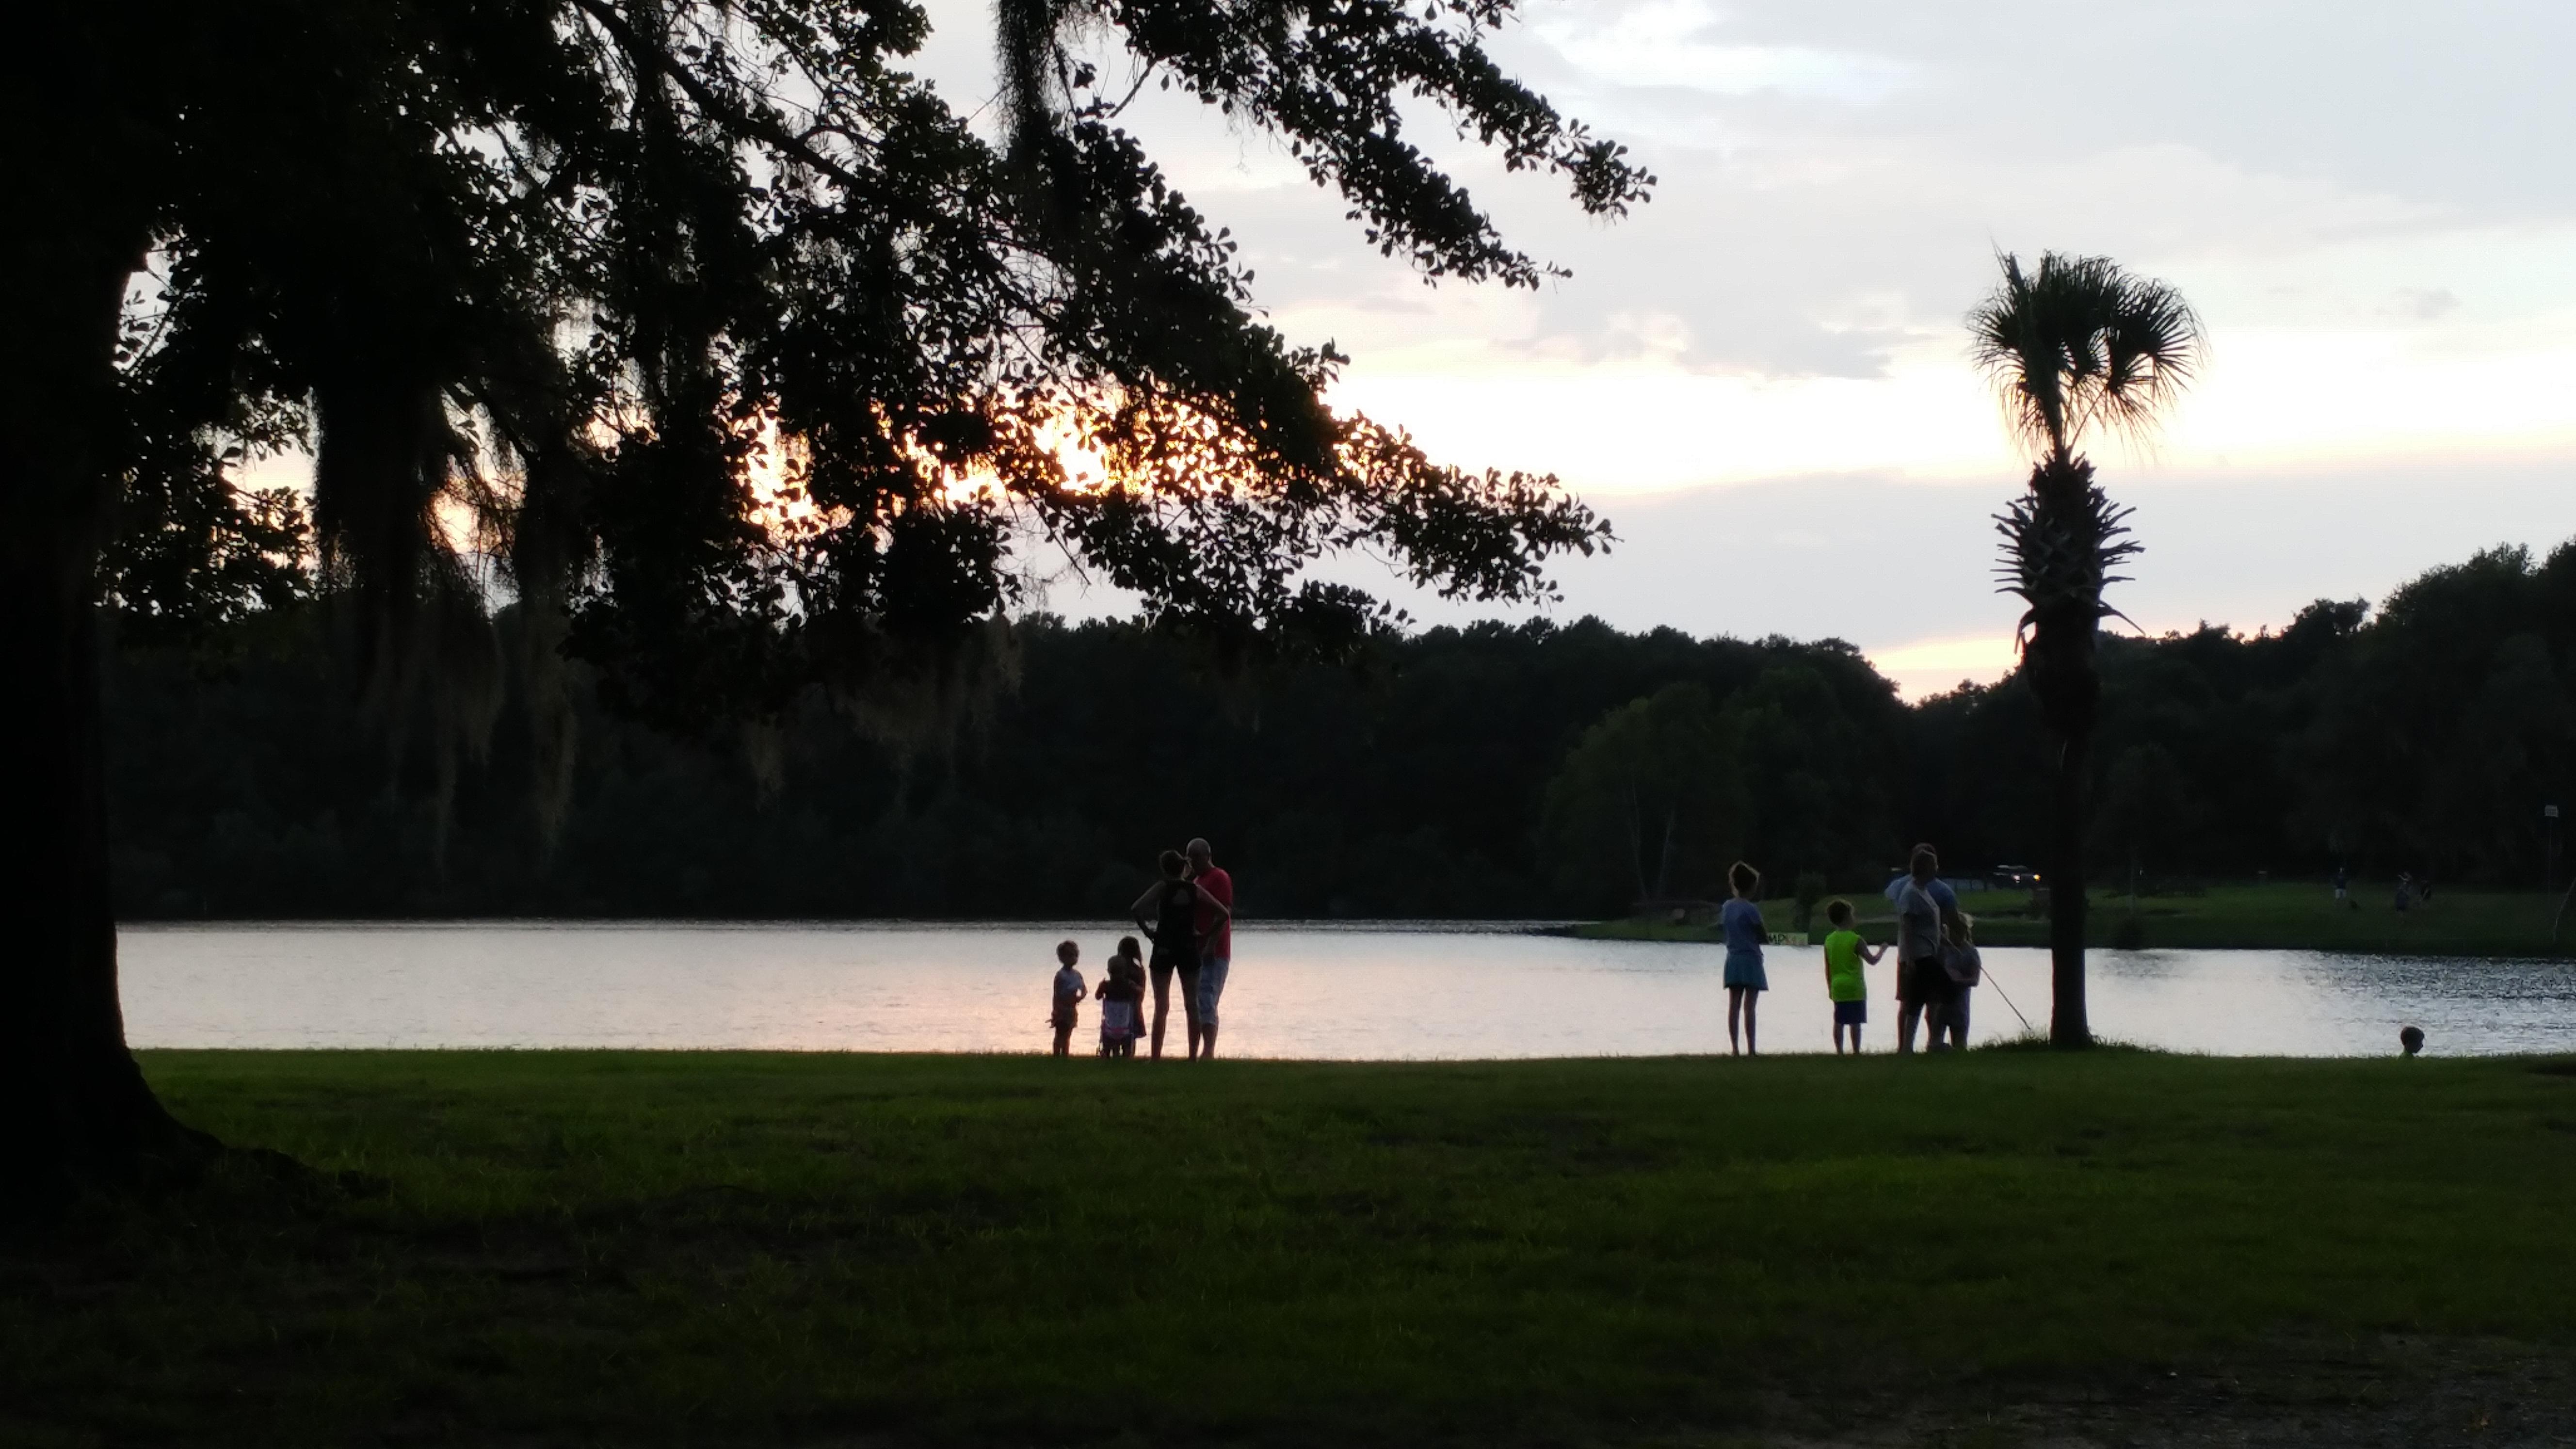 Mount Pleasant / Charleston KOA Holiday image 47